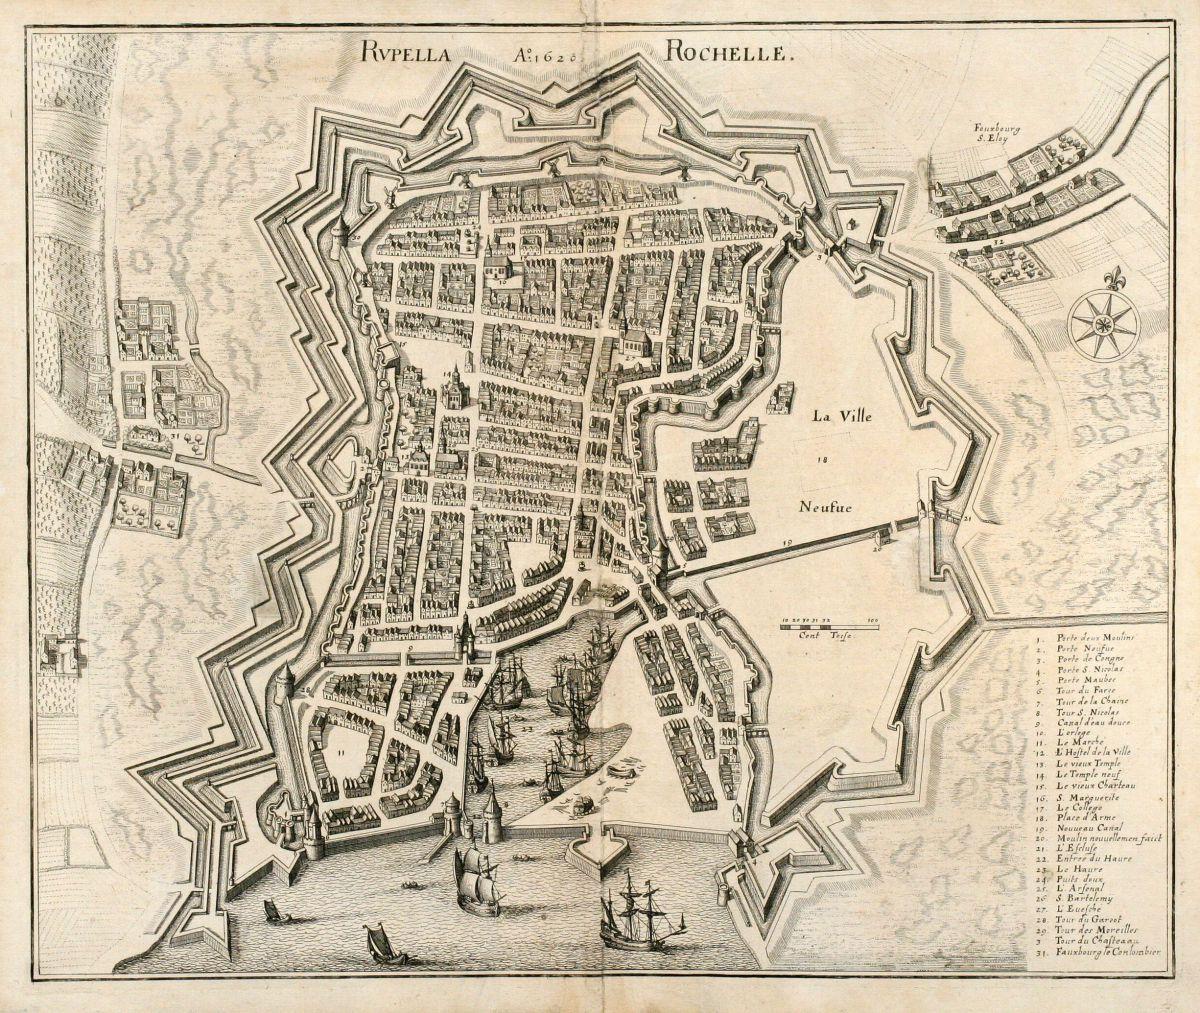 Map Of France La Rochelle.Rupella Rochelle Merian France La Rochelle Poitou Charentes 1657